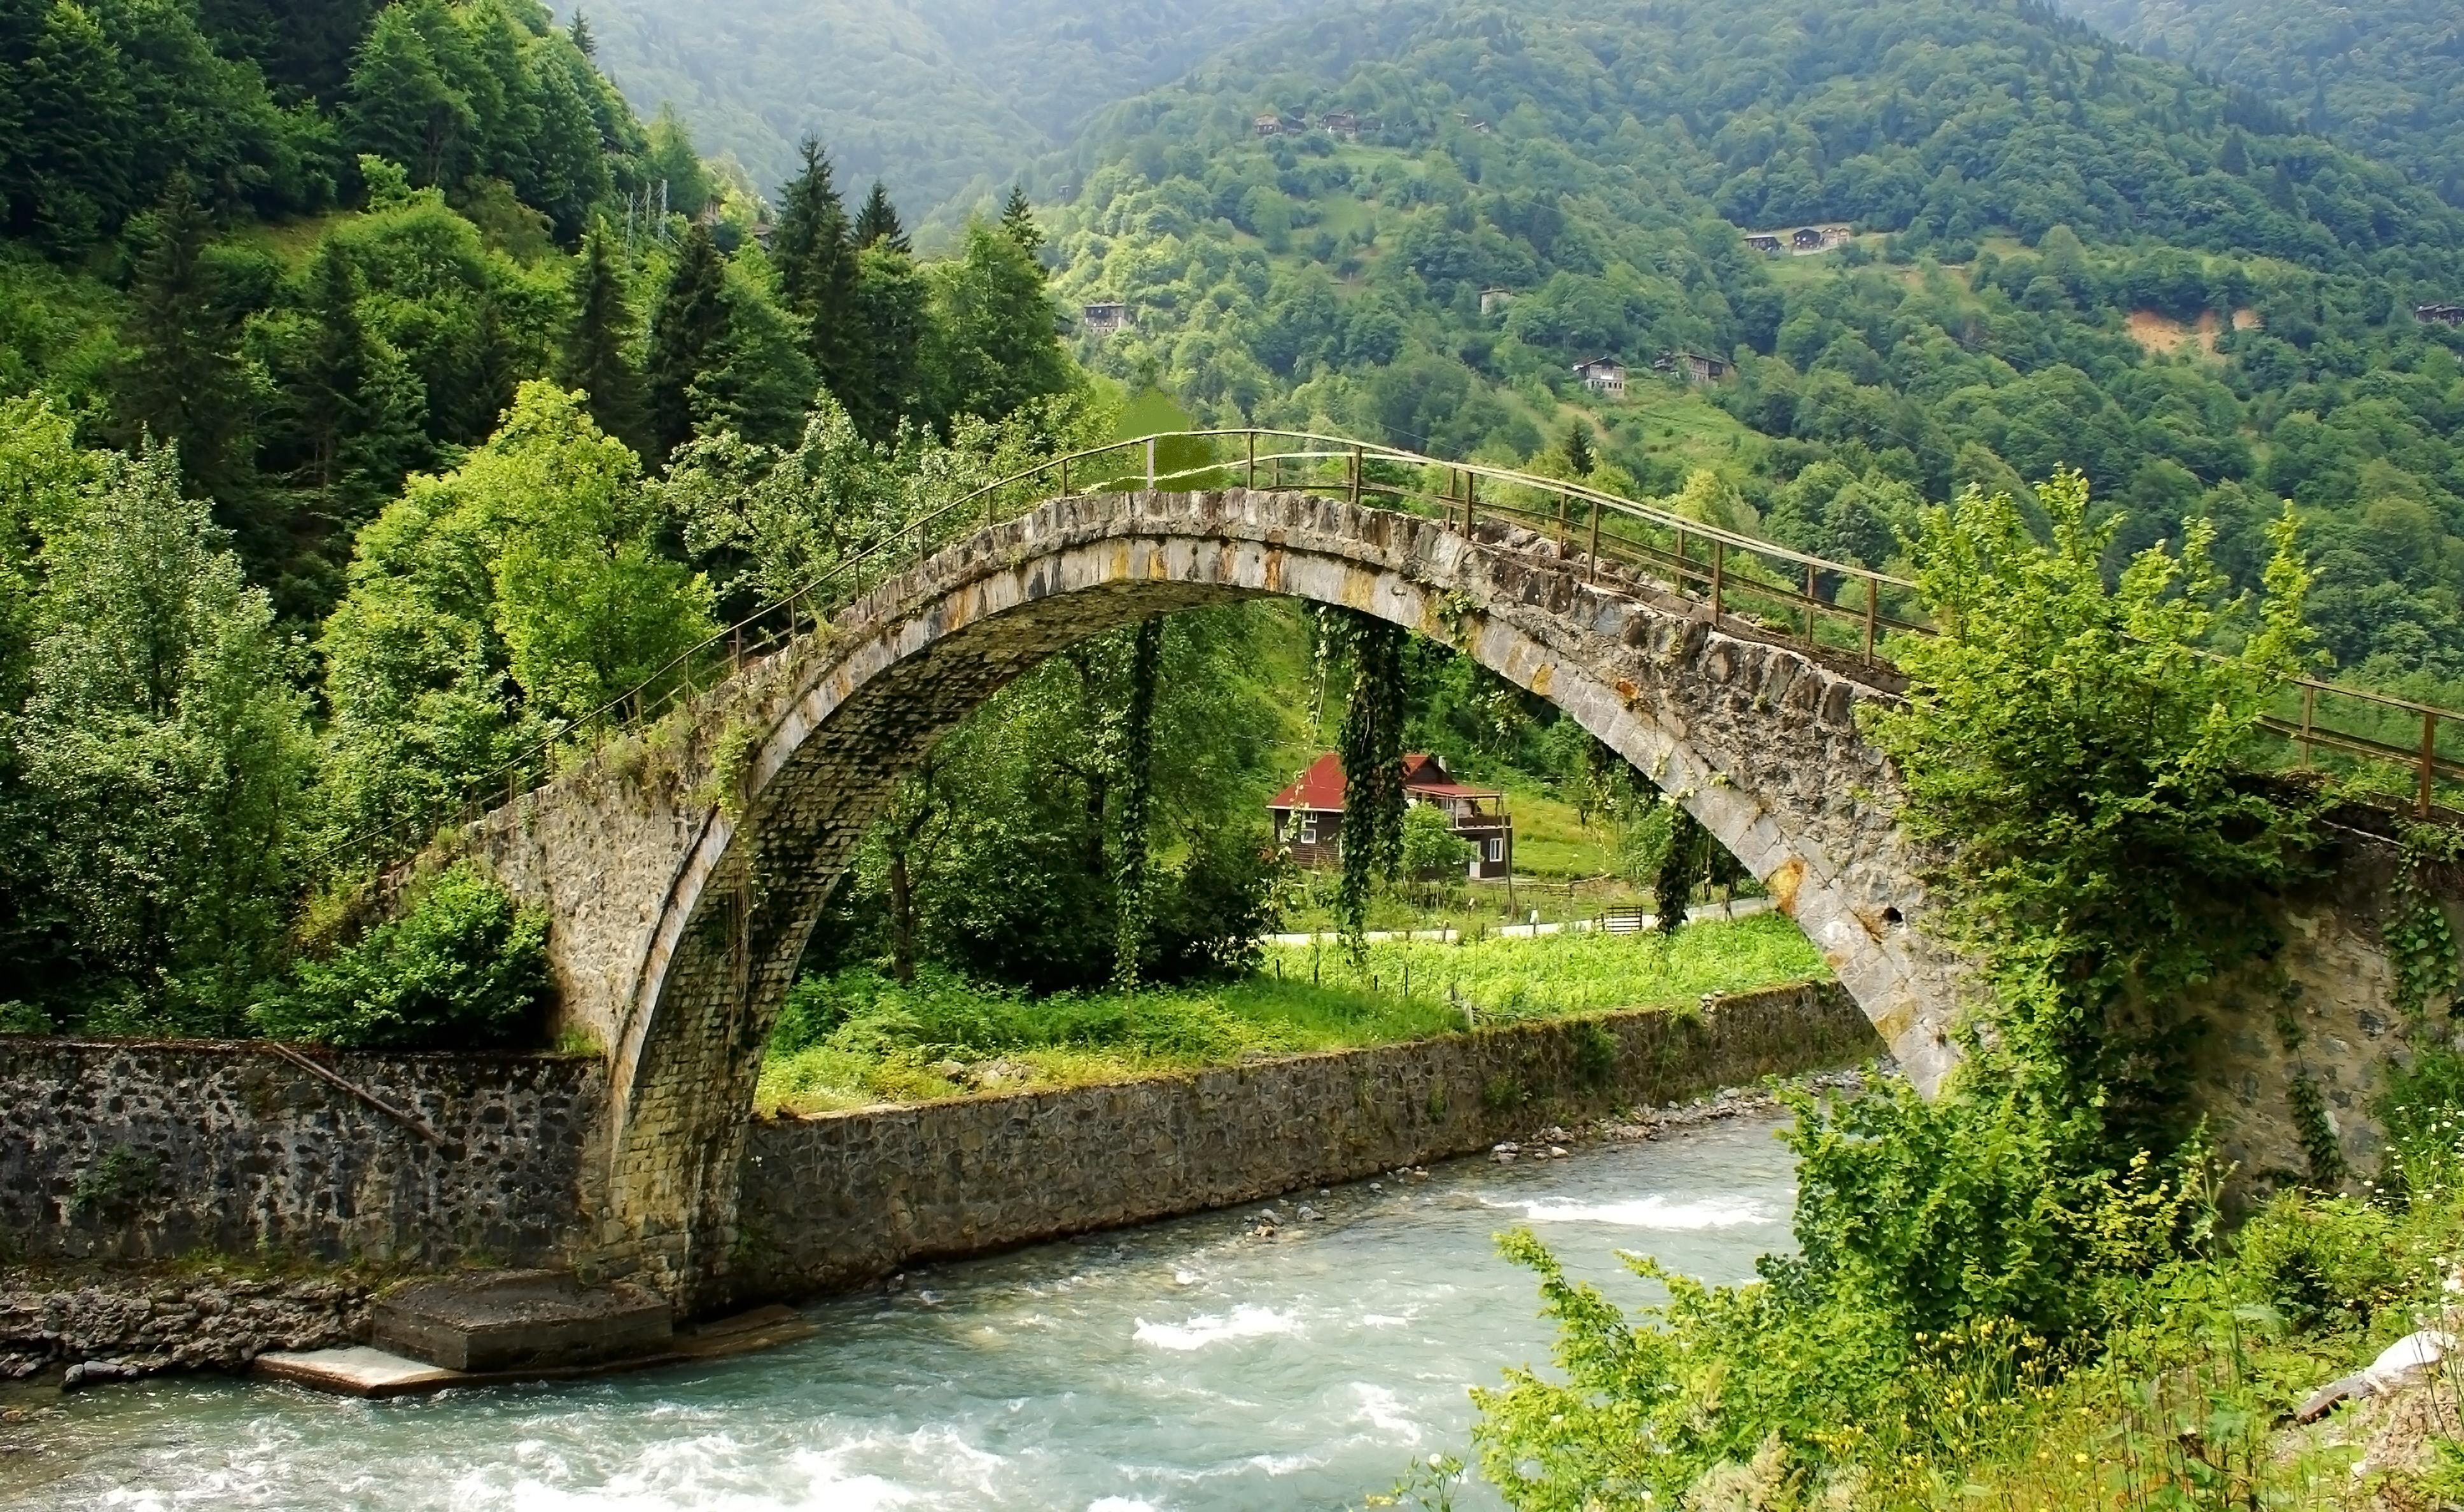 rize ayder planalto camlihemsin turquia wallpaper   ForWallpapercom 3872x2376